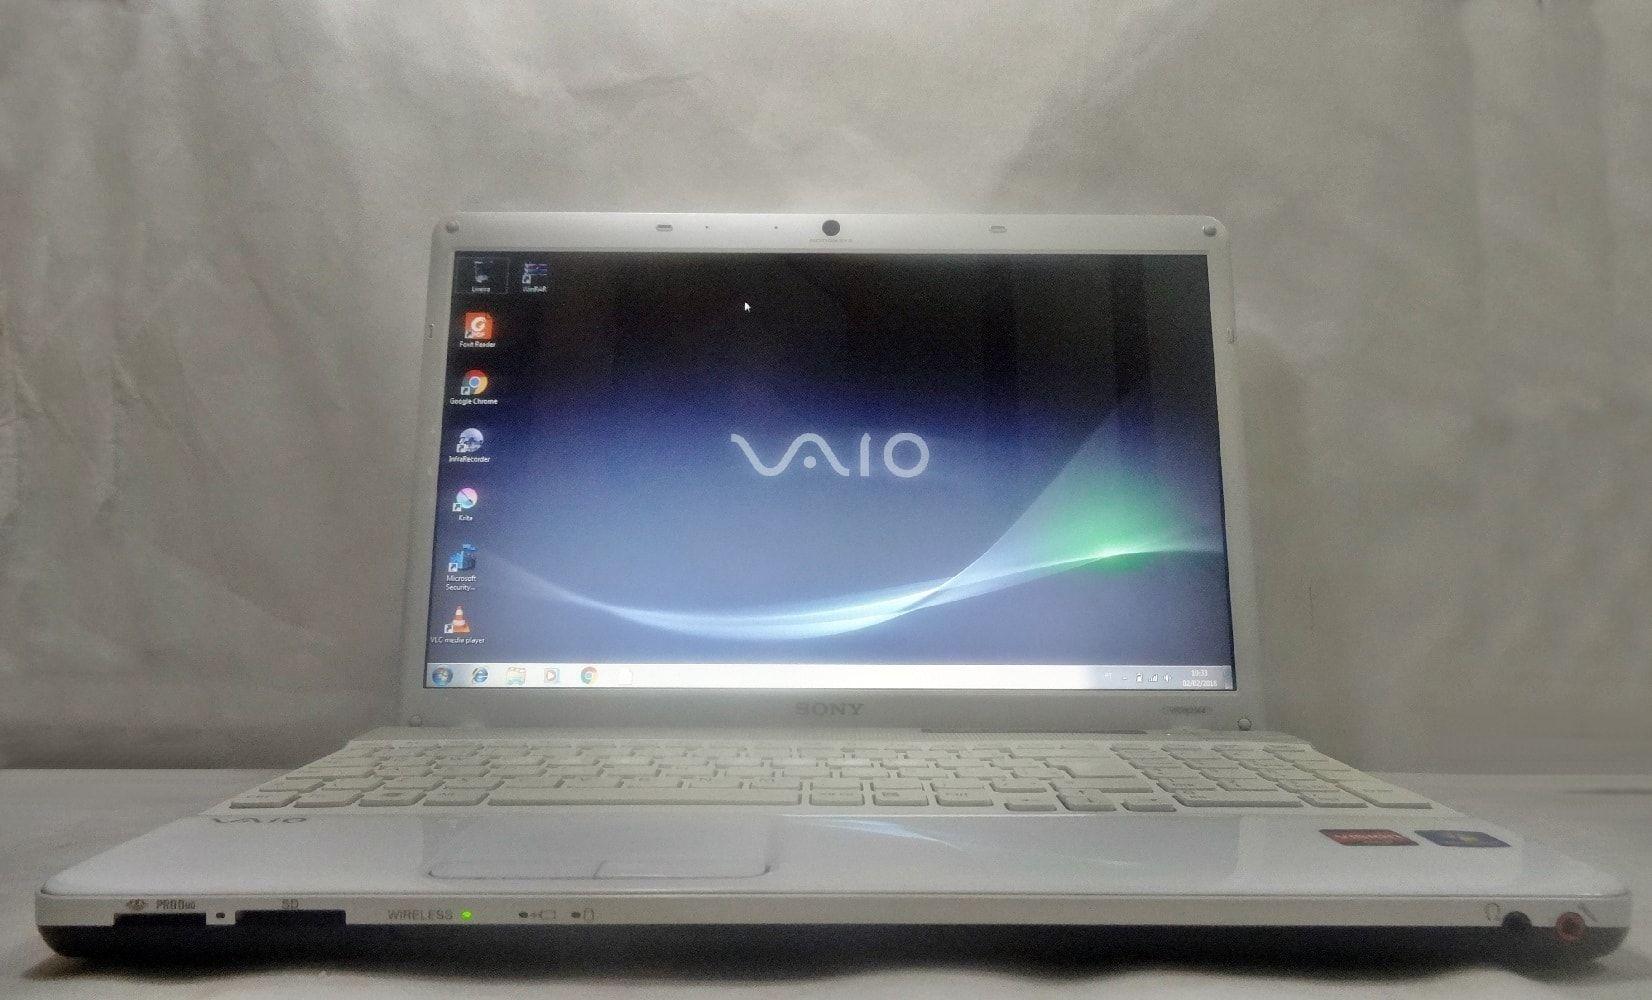 Notebook Sony Vaio VPCEE23EB 15.5